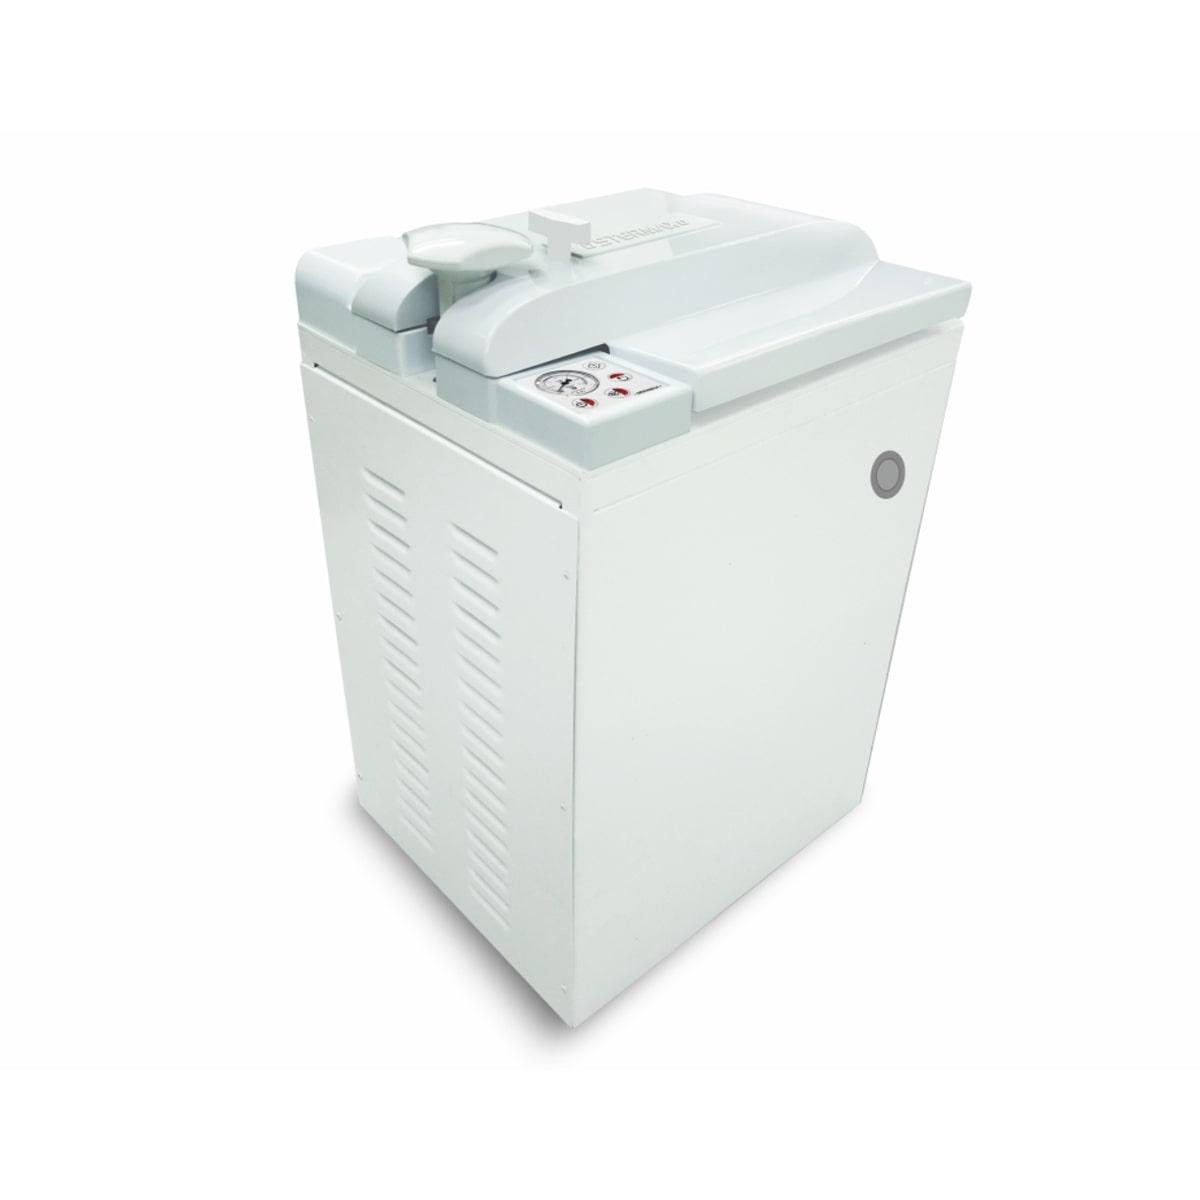 Autoclave Vertical Analógica Gravitacional Normal Box 30 litros  Stermax